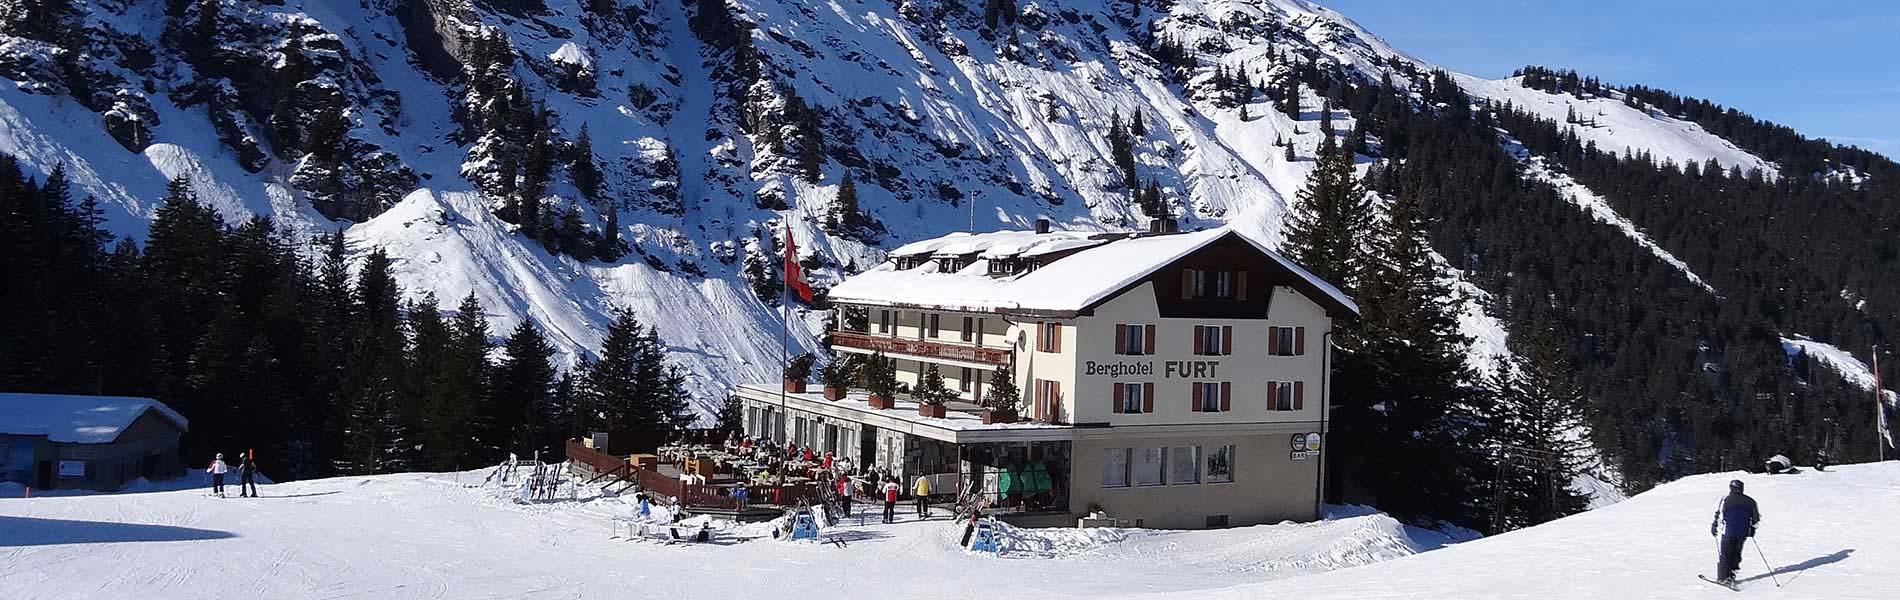 Hotel Furt Winter